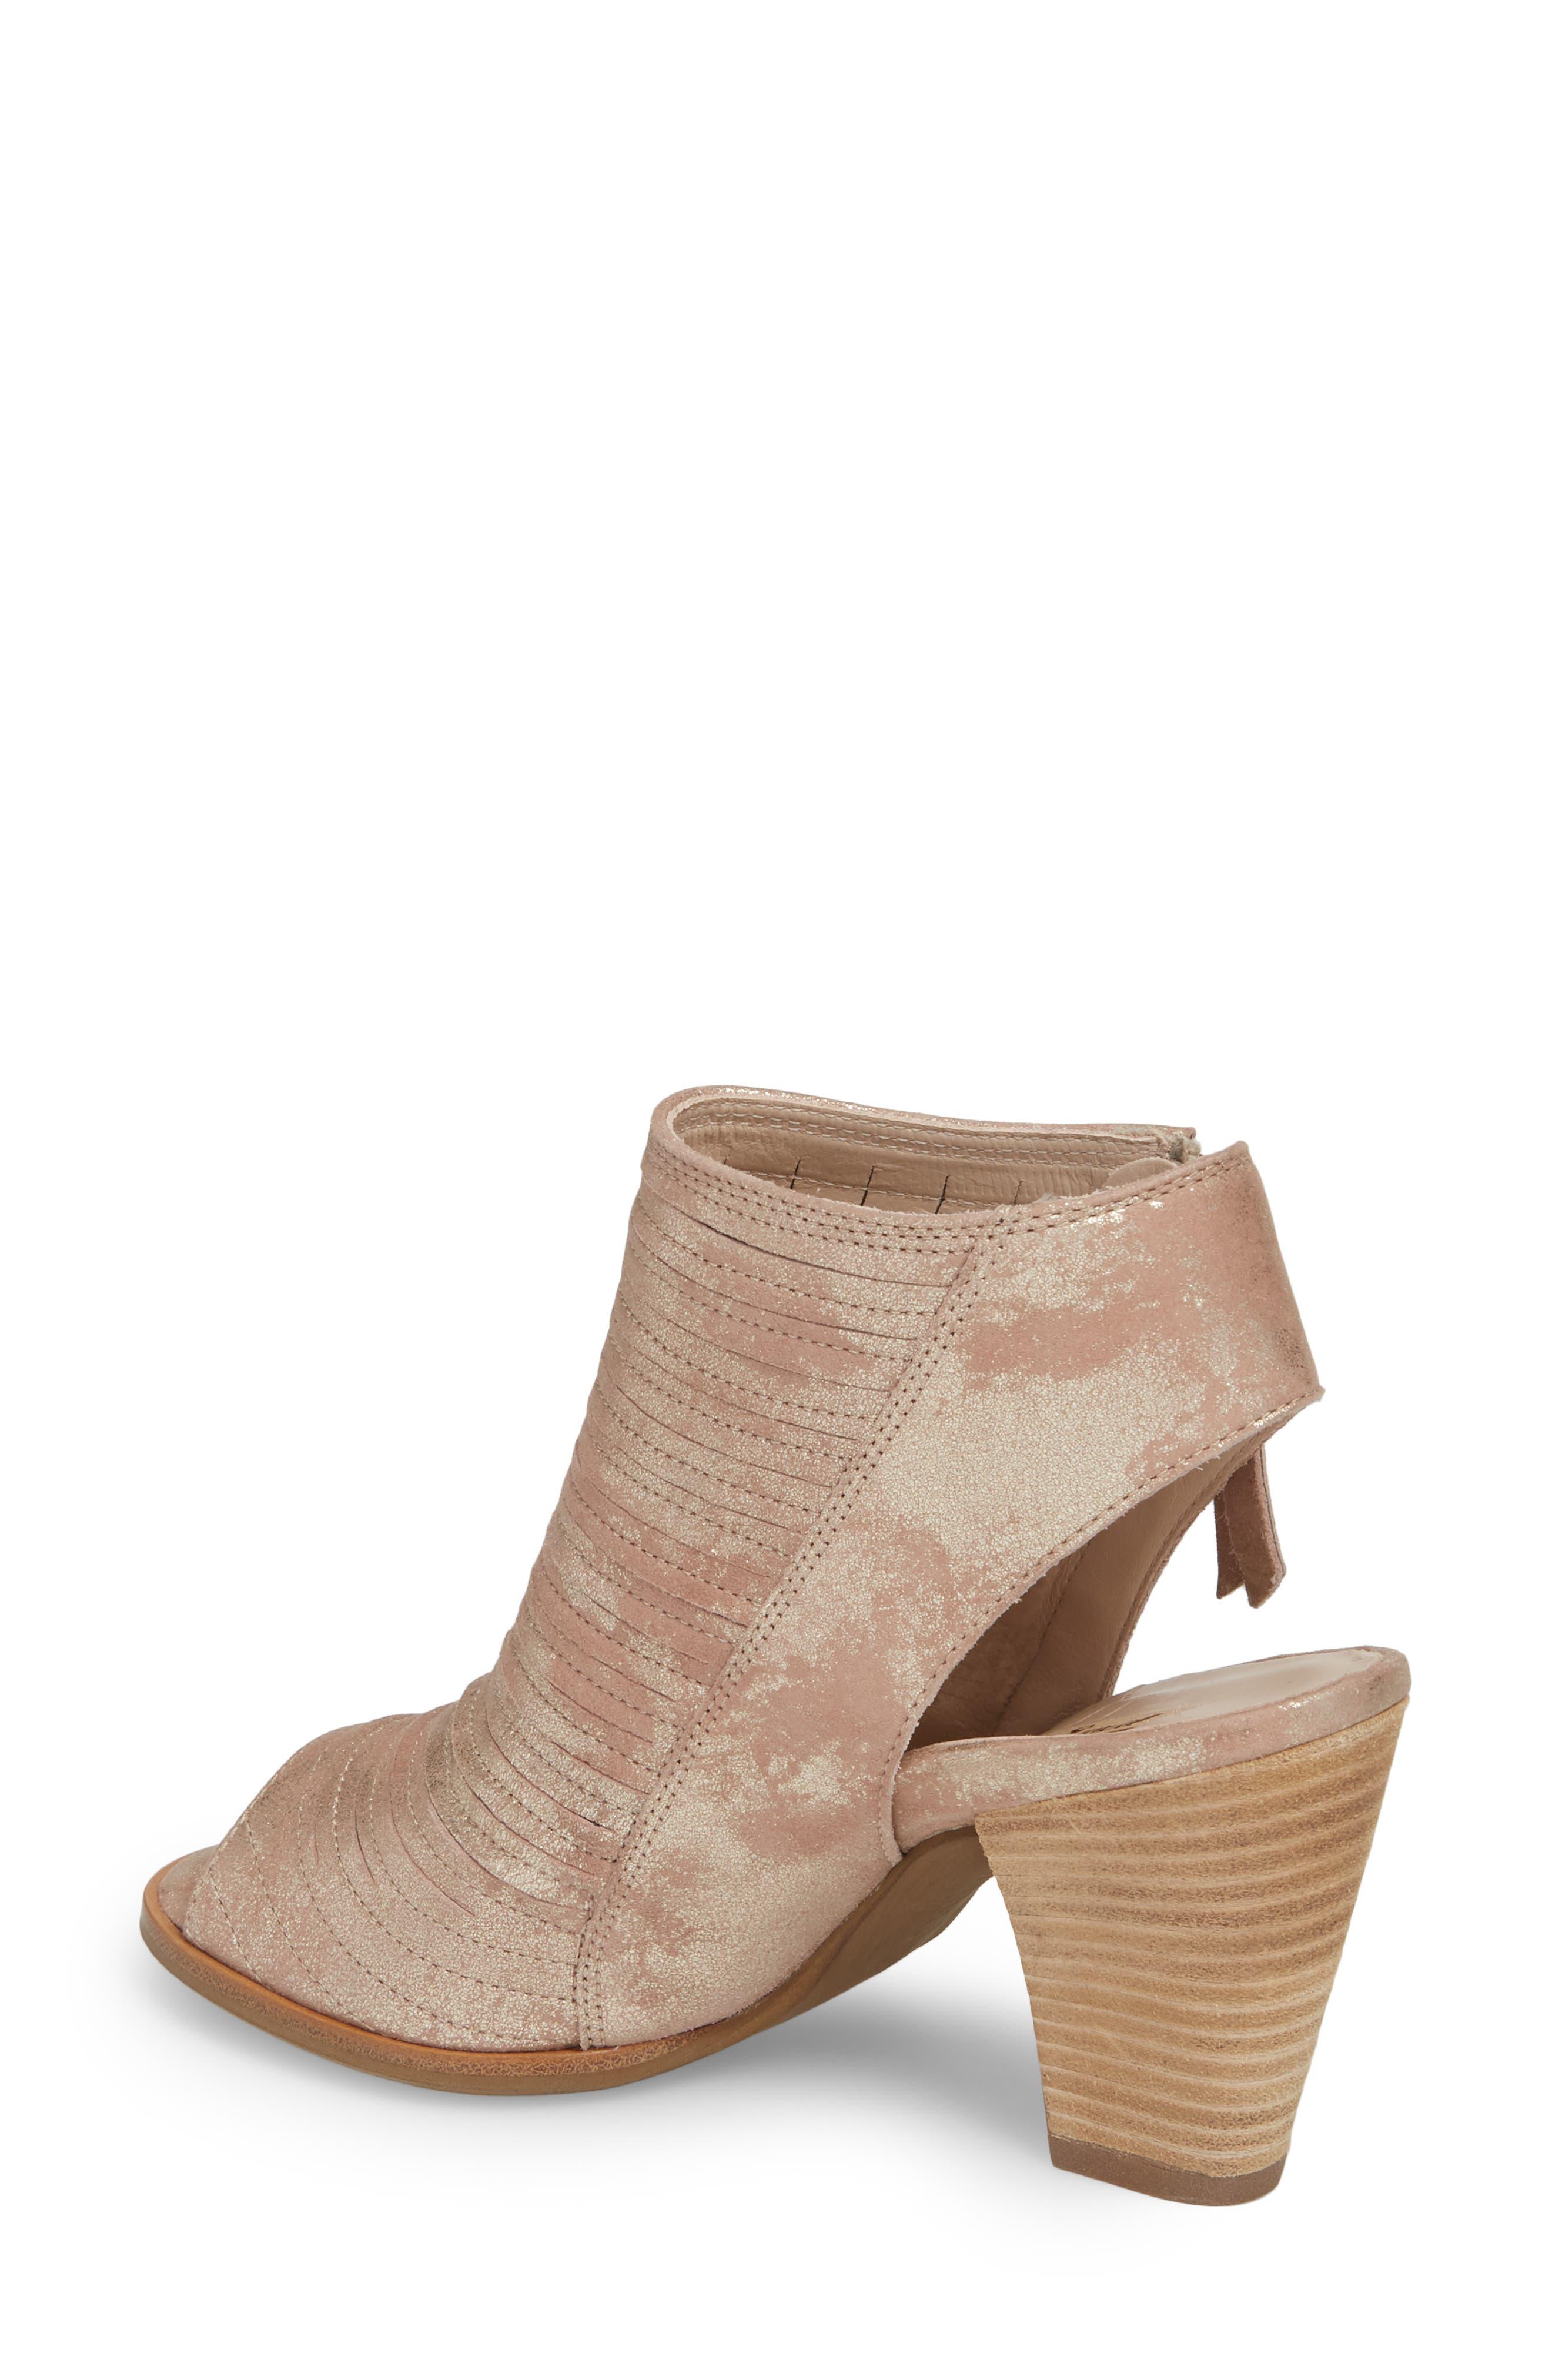 'Cayanne' Leather Peep Toe Sandal,                             Alternate thumbnail 12, color,